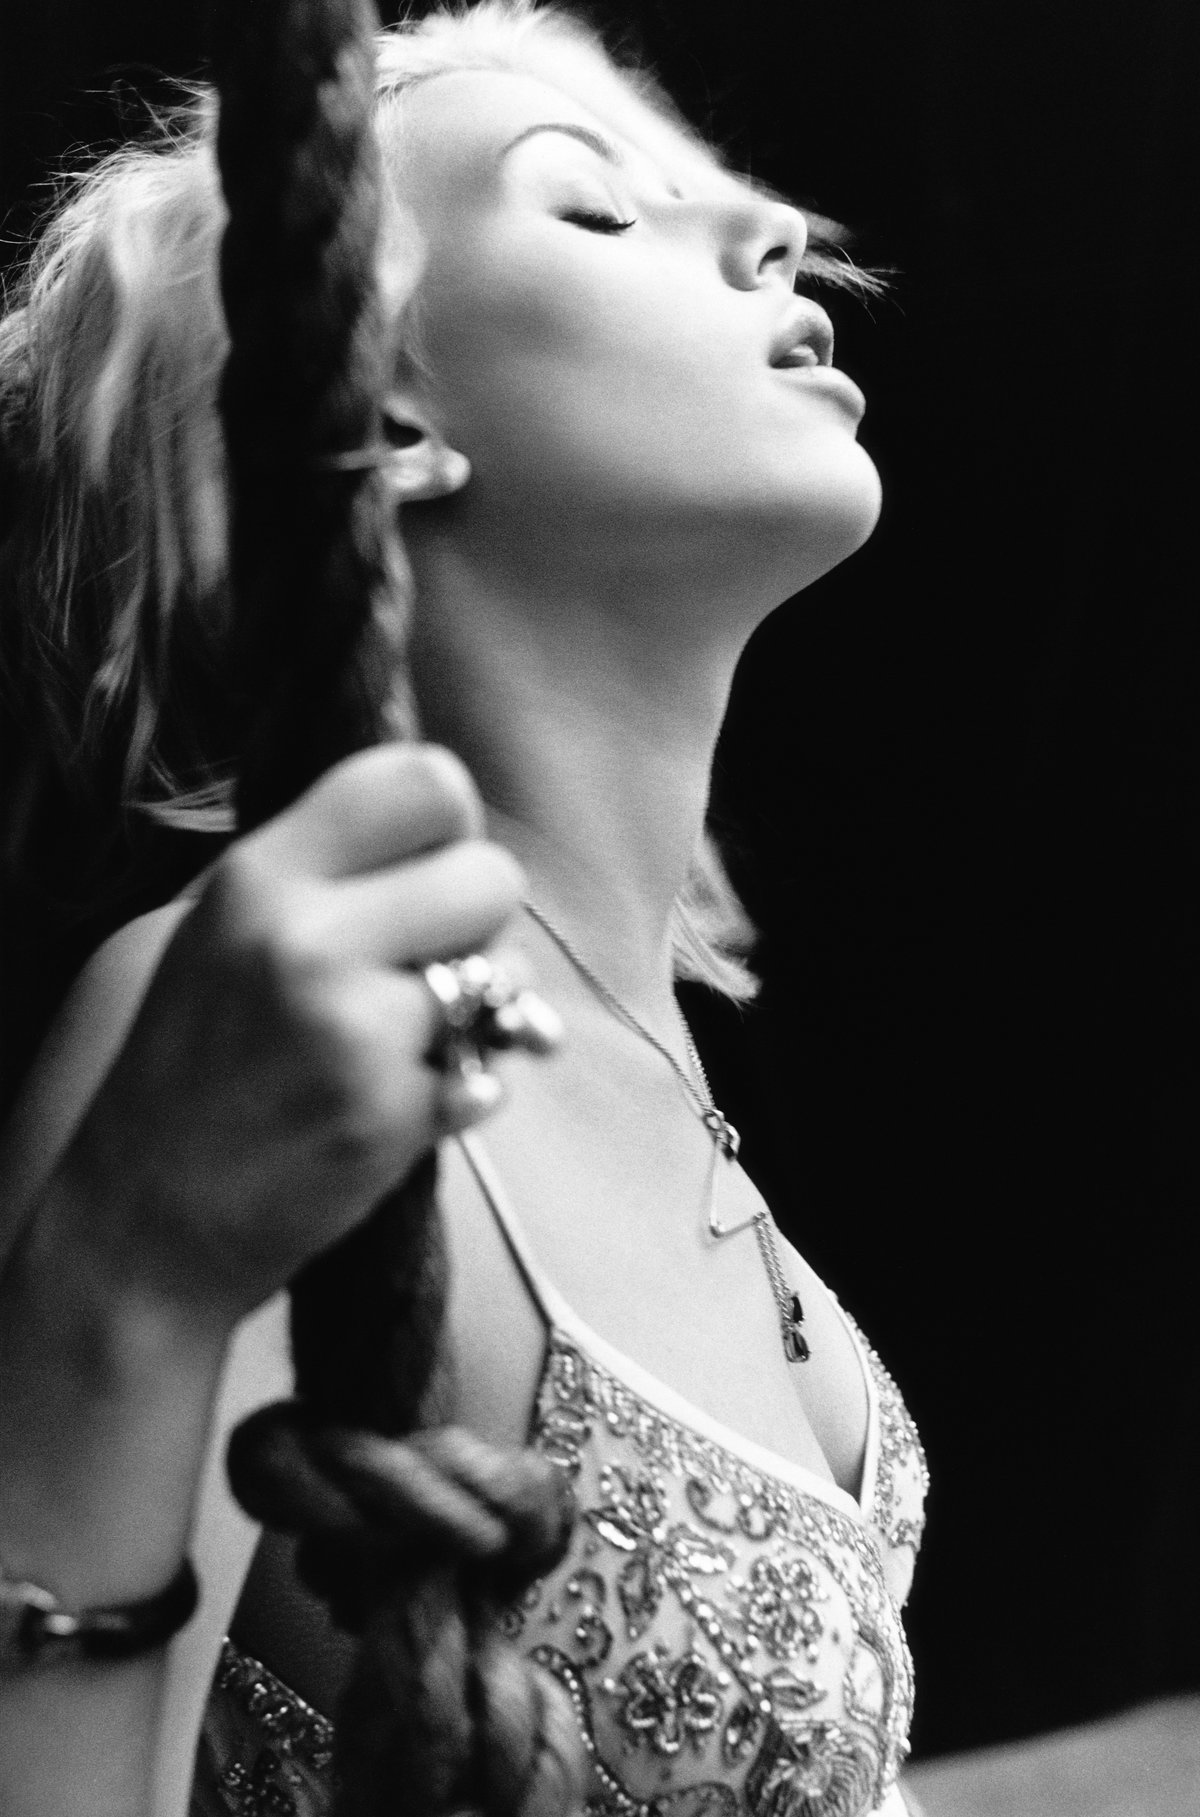 Scarlett johansson yariv milchan 2004 uhq photo shoot - 2019 year